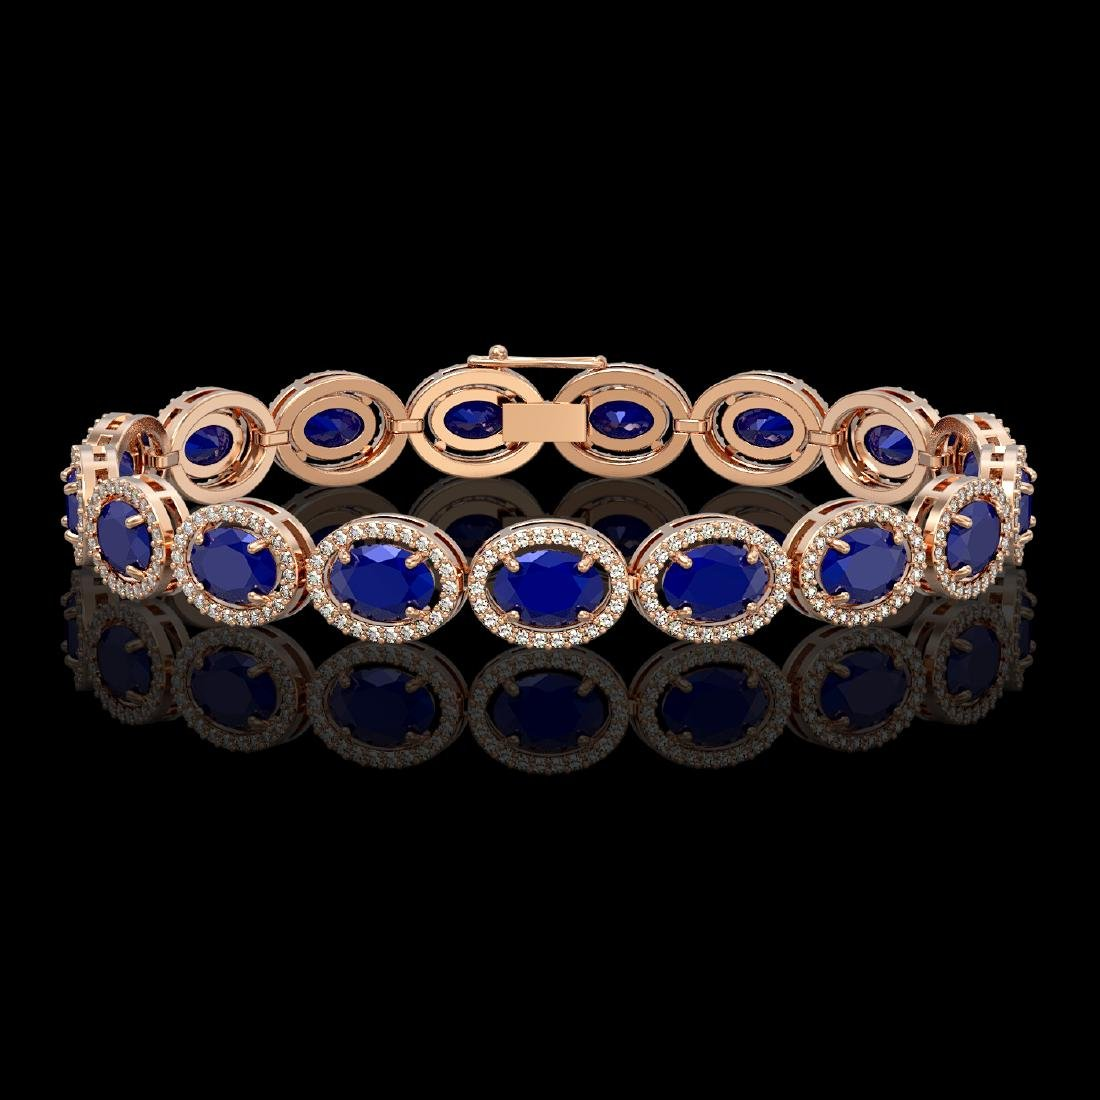 22.89 CTW Sapphire & Diamond Halo Bracelet 10K Rose